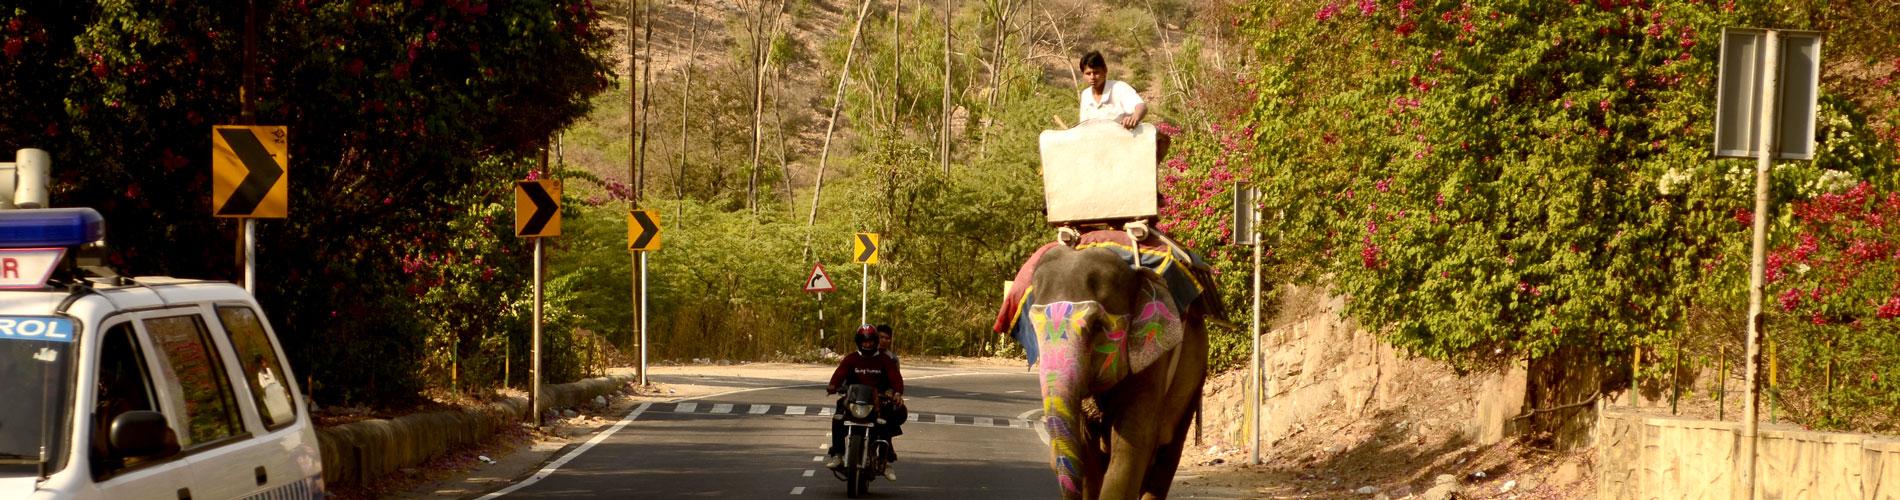 LUNA DE MIEL EN INDIA CON HOTELES OBEROI| Operadora Travel Shop